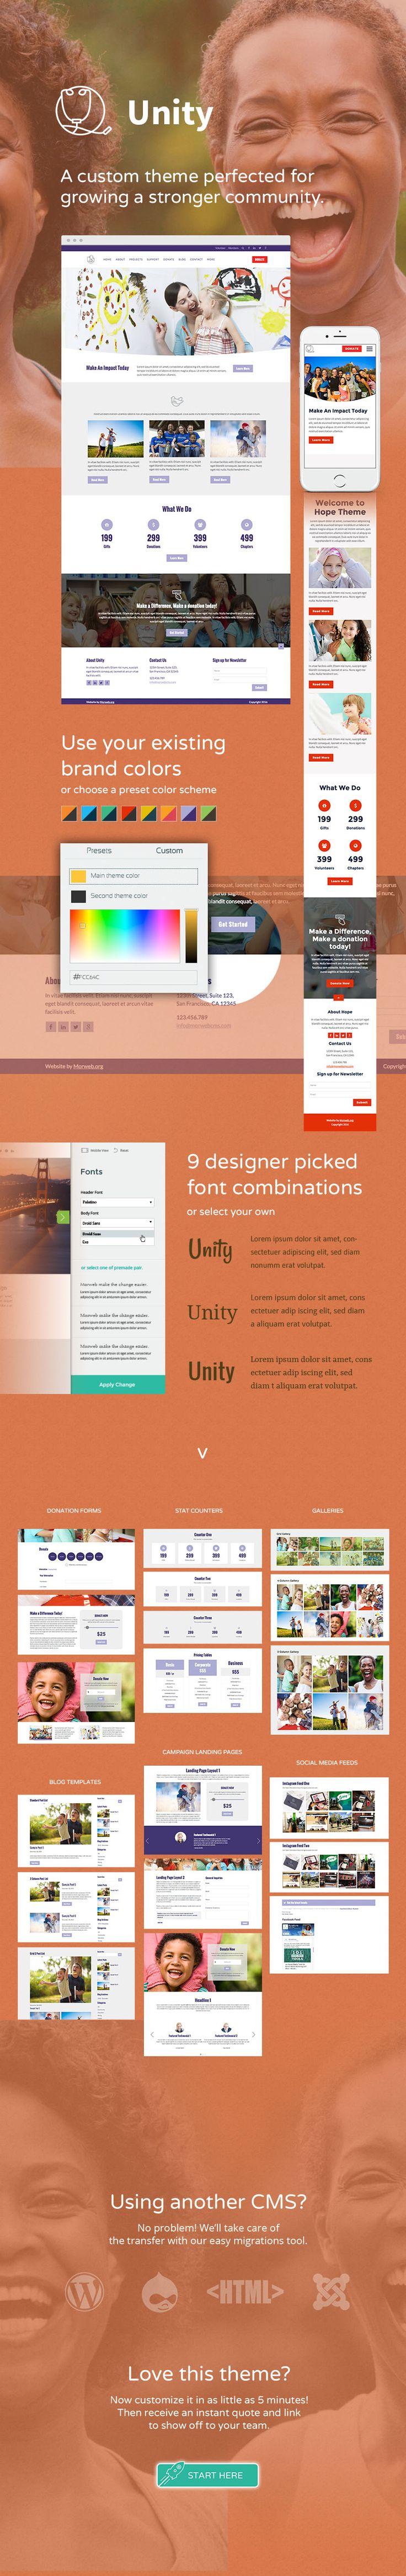 Unity Theme - Morweb.org